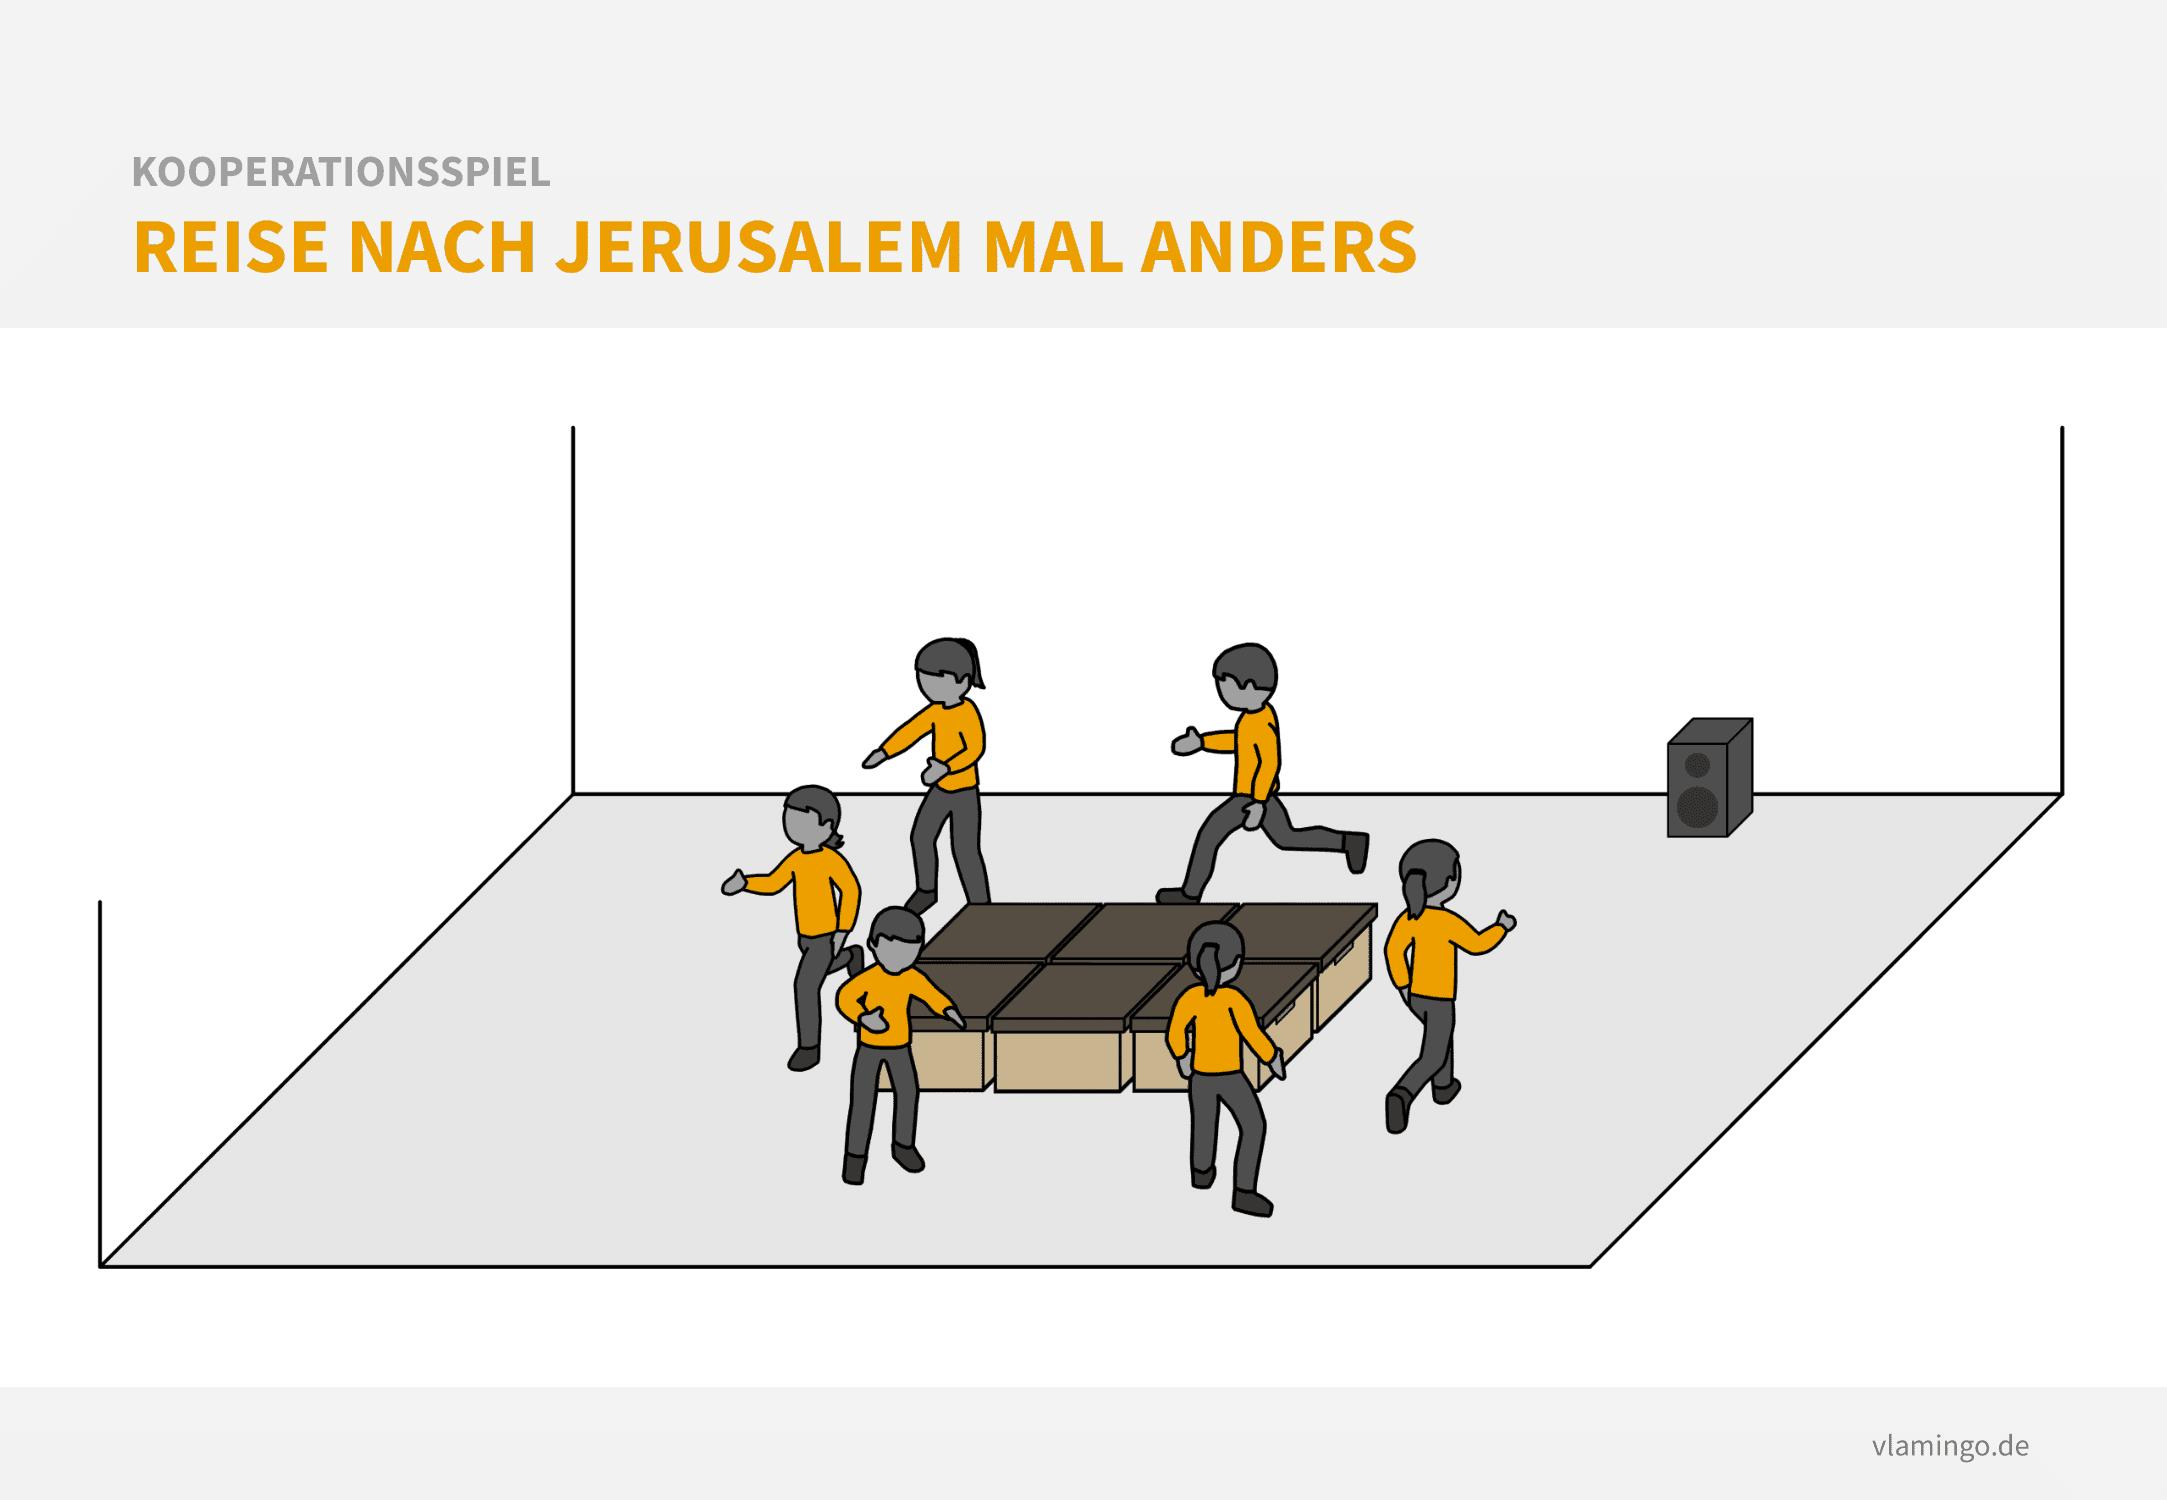 Kooperationsspiel: Reise nach Jerusalem mal anders